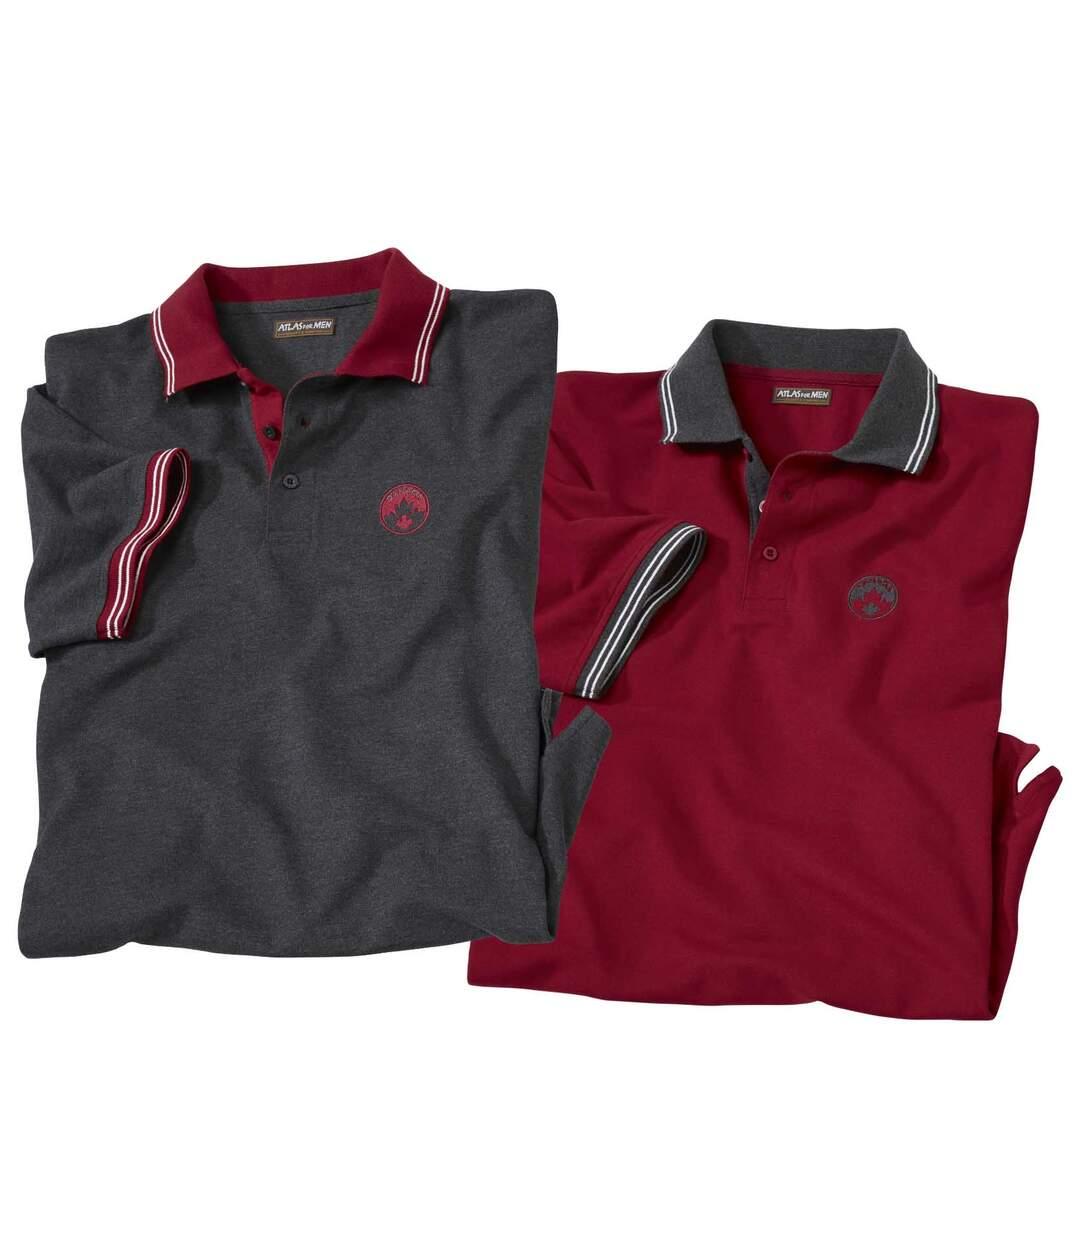 2er-Pack lässige Poloshirts